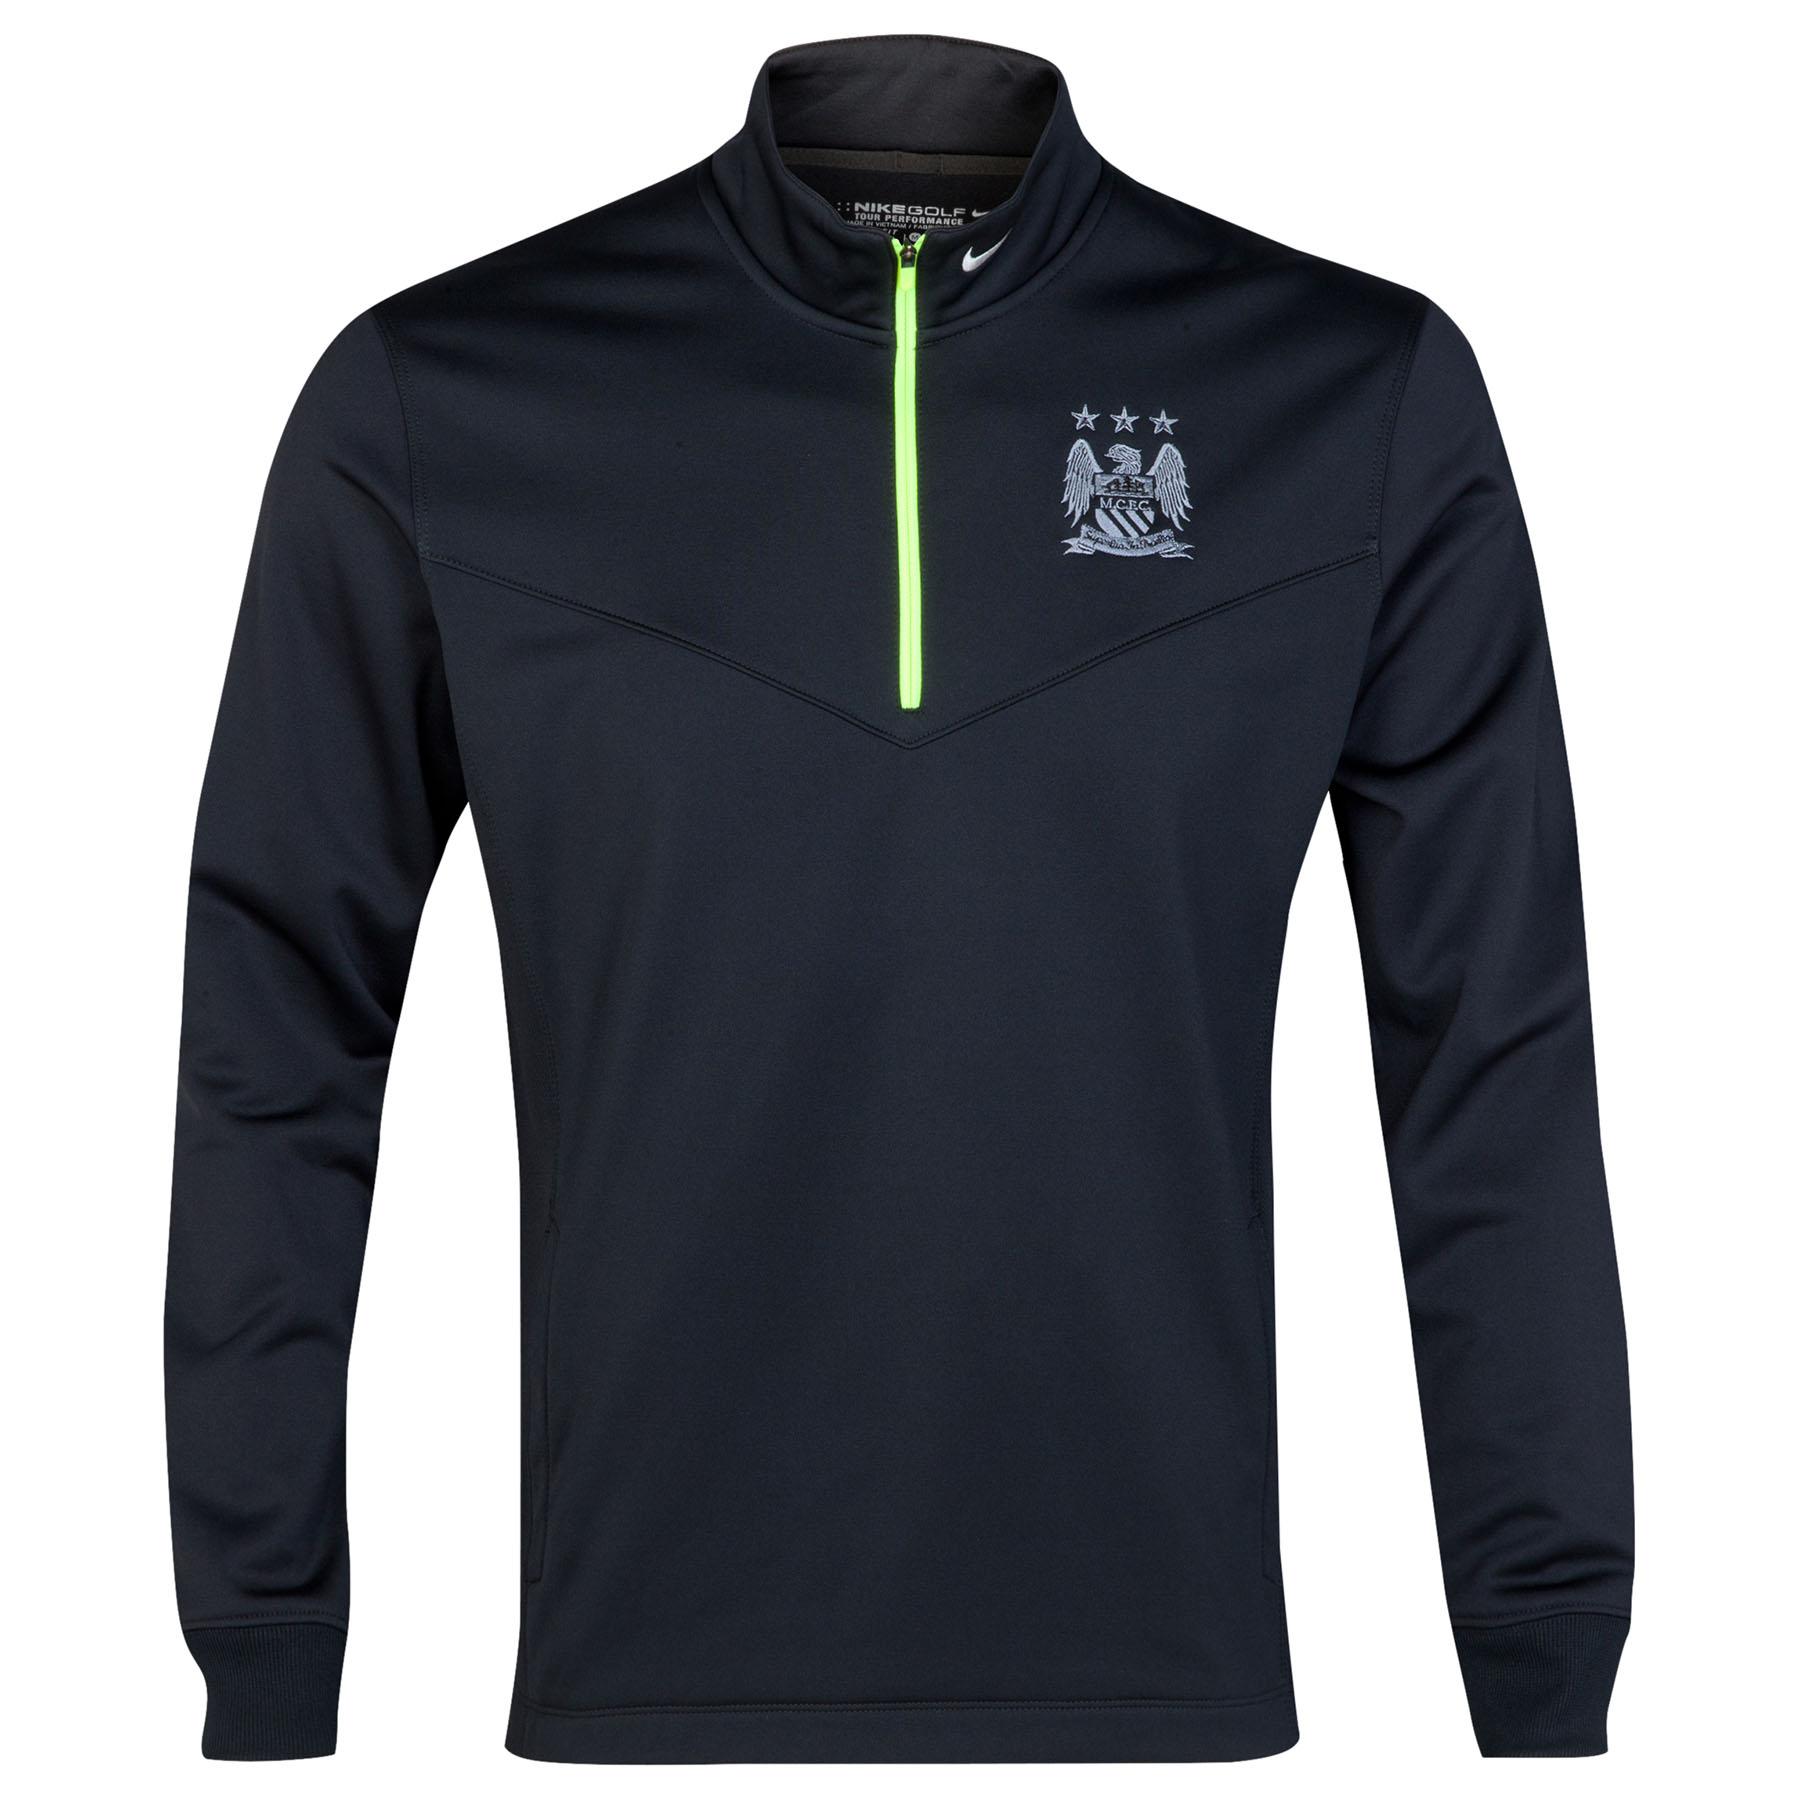 Manchester City Thermal Half Zip Top Black